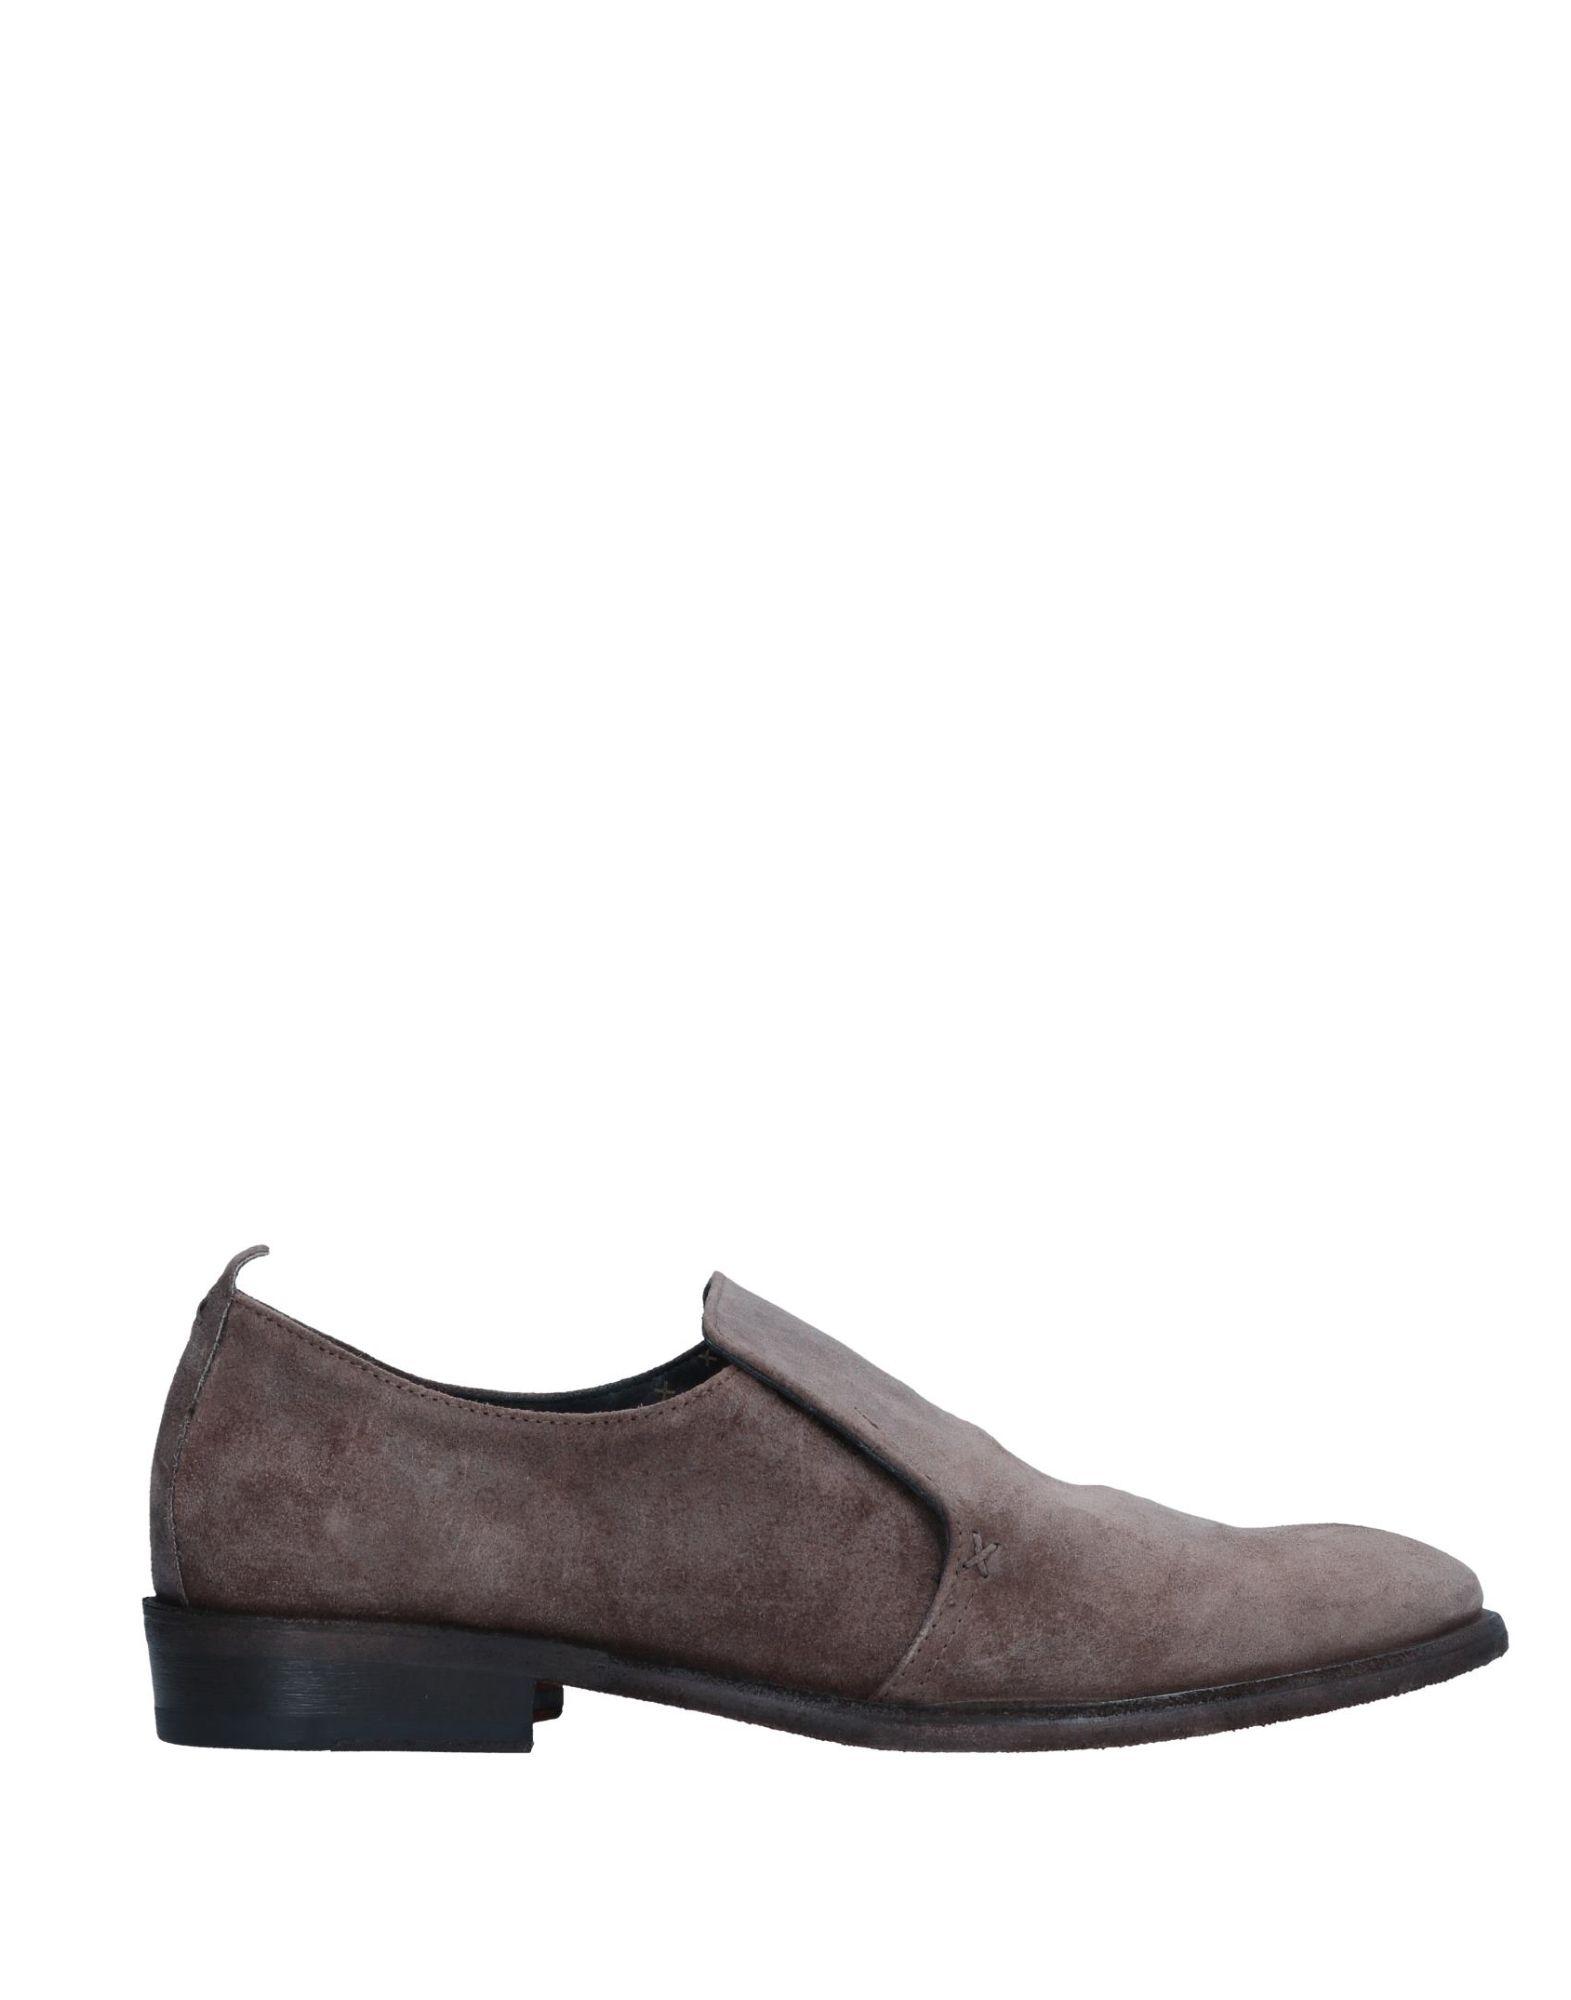 Fiorentini+Baker Mokassins Herren  11546555VV Gute Qualität beliebte Schuhe